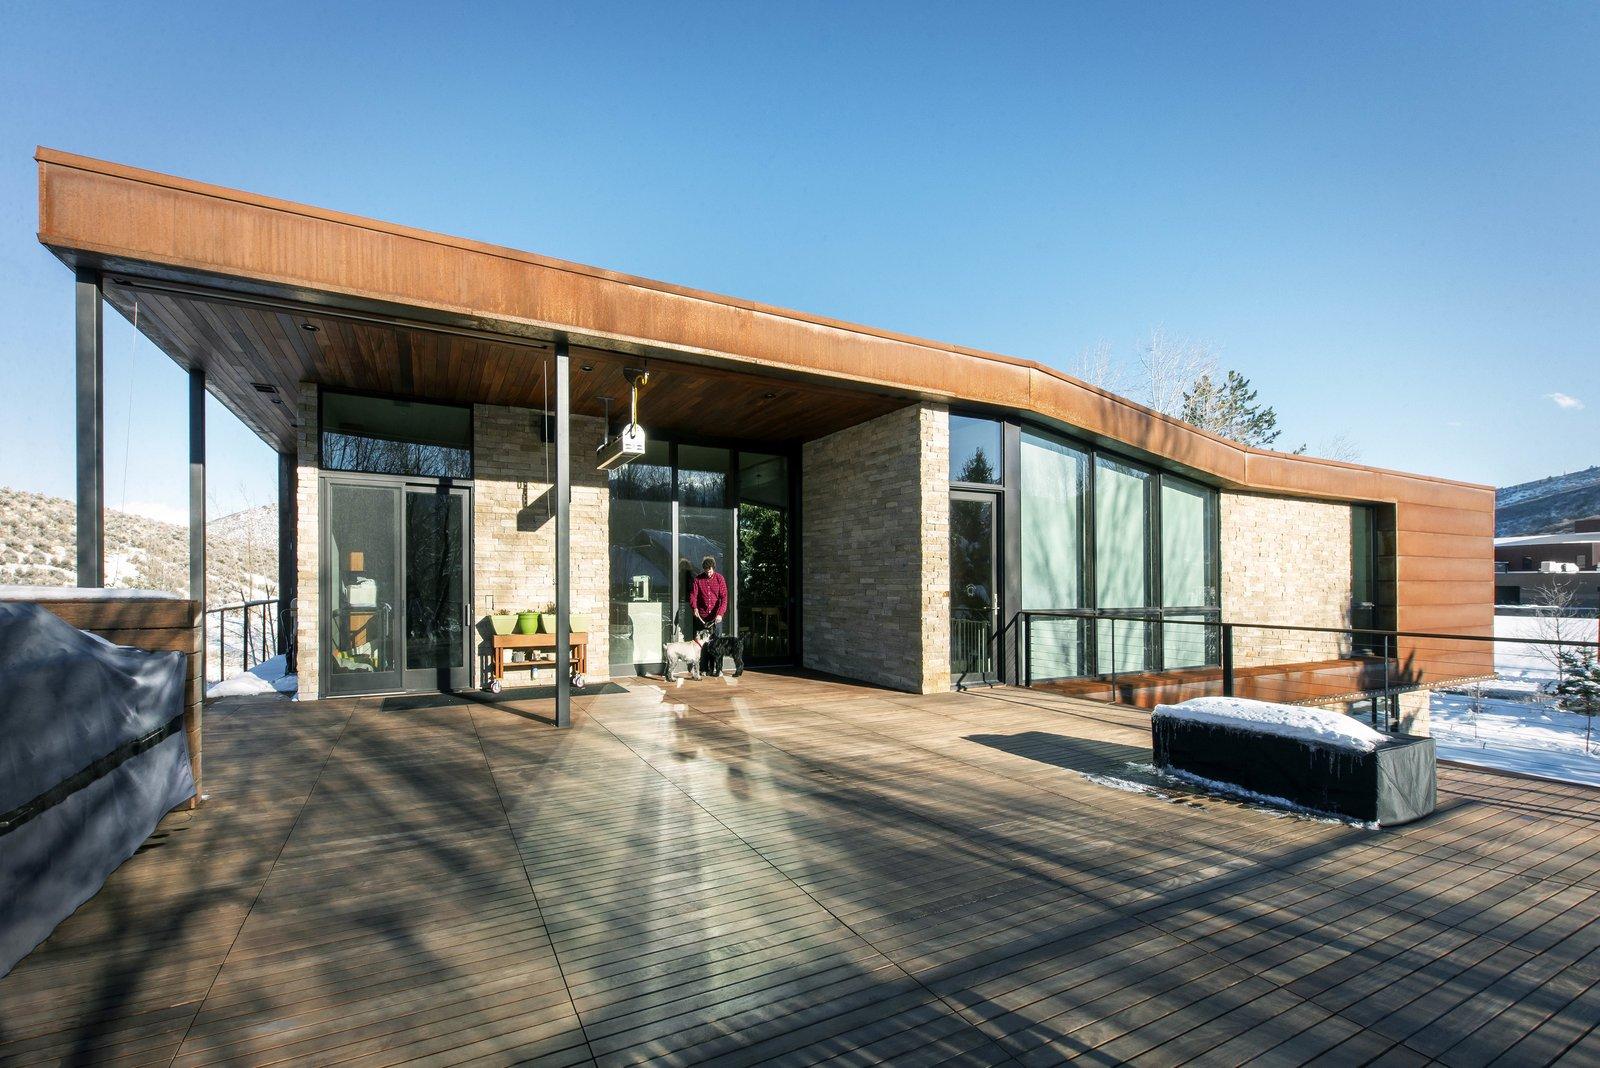 Rooftop Deck  Lucky John Home by Imbue Design